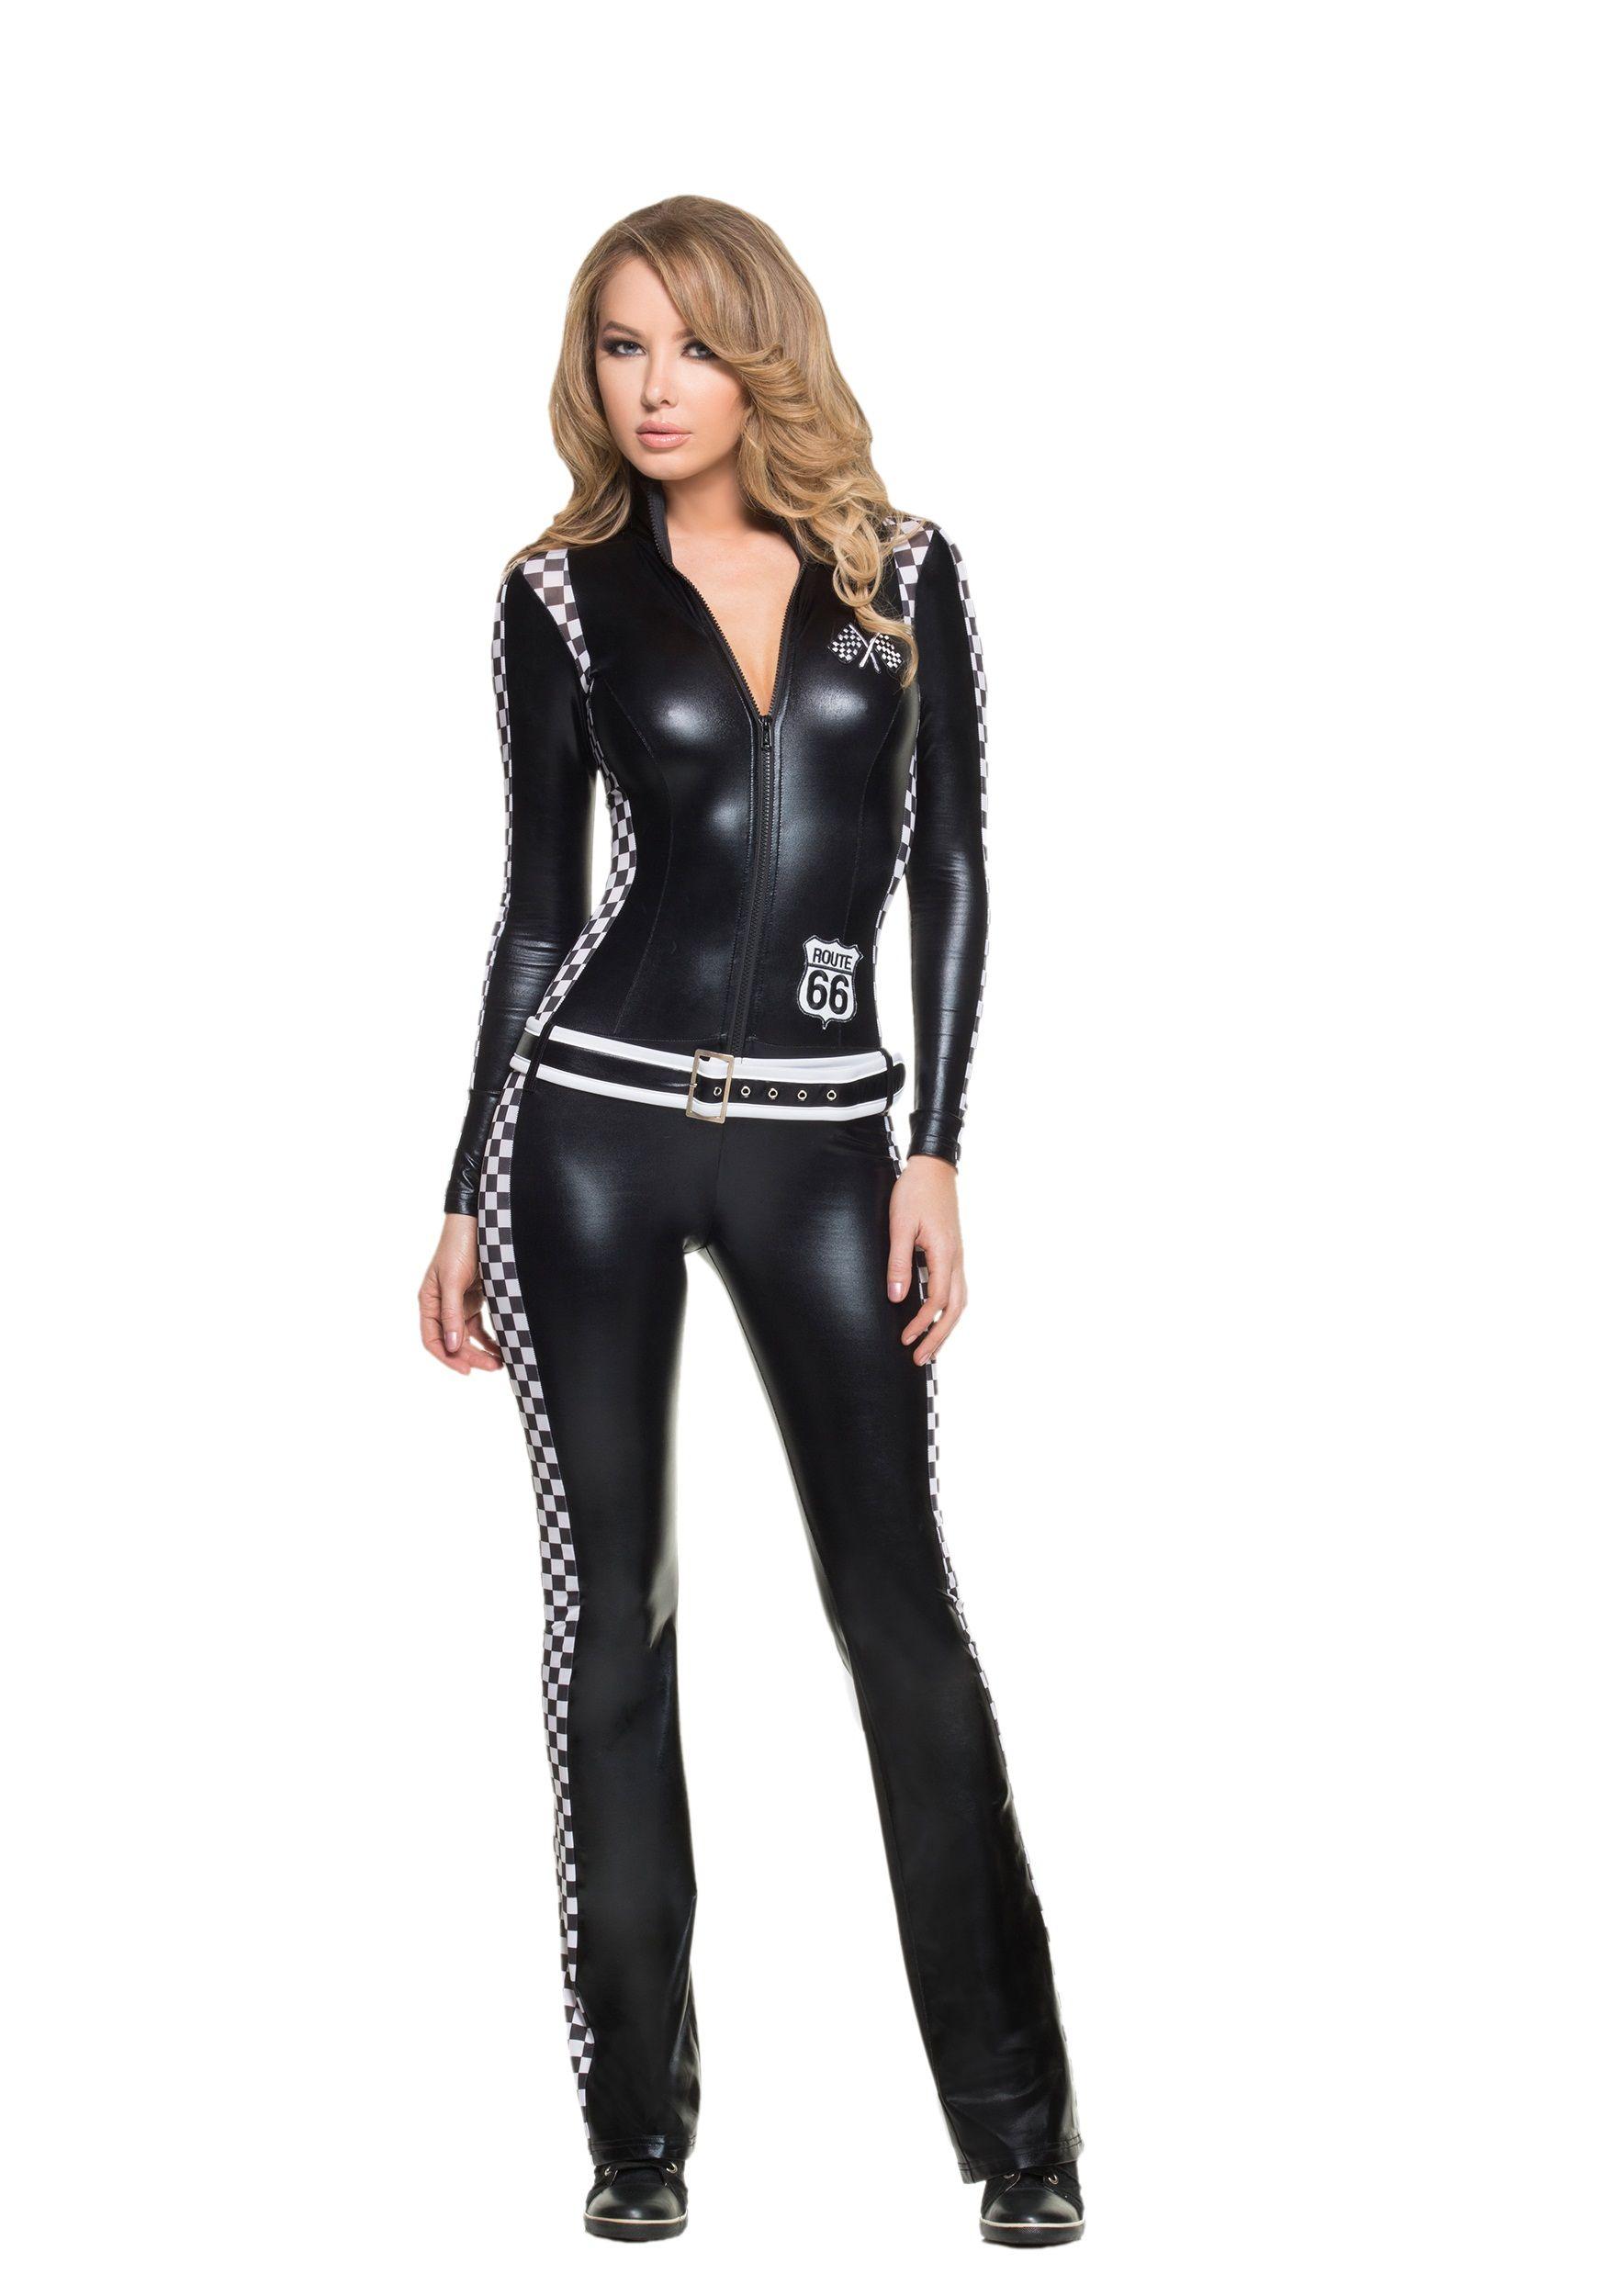 Women's Racer Girl Costume | Halloween Costume Ideas 2014 ...